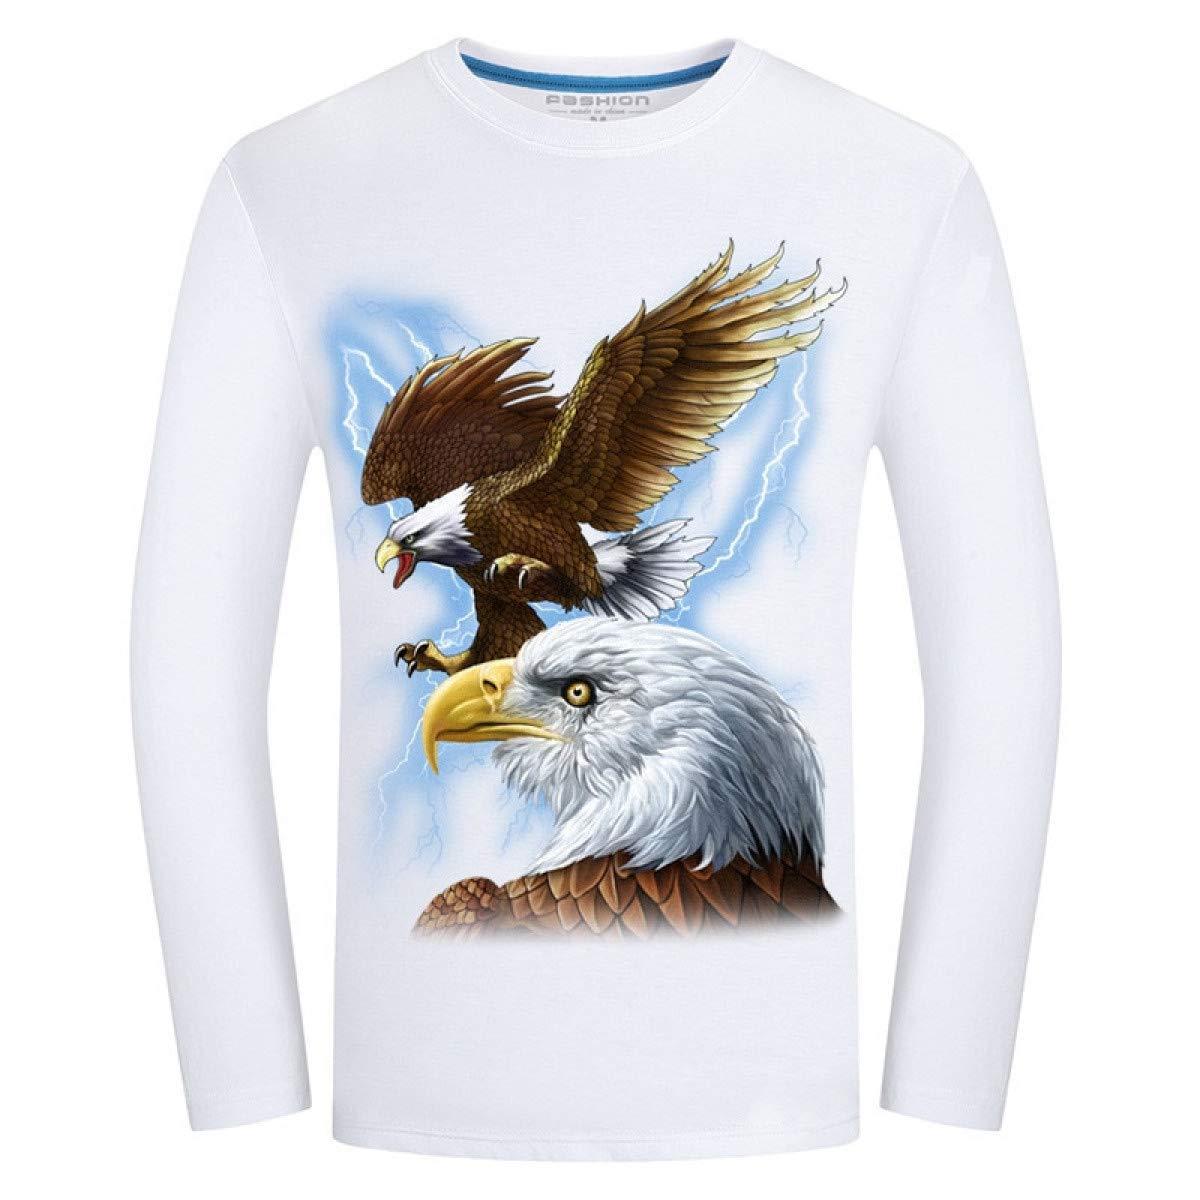 FLAMENCO_STORE Men t-Shirt Long Sleeve Cool Design 3D Funny t ...